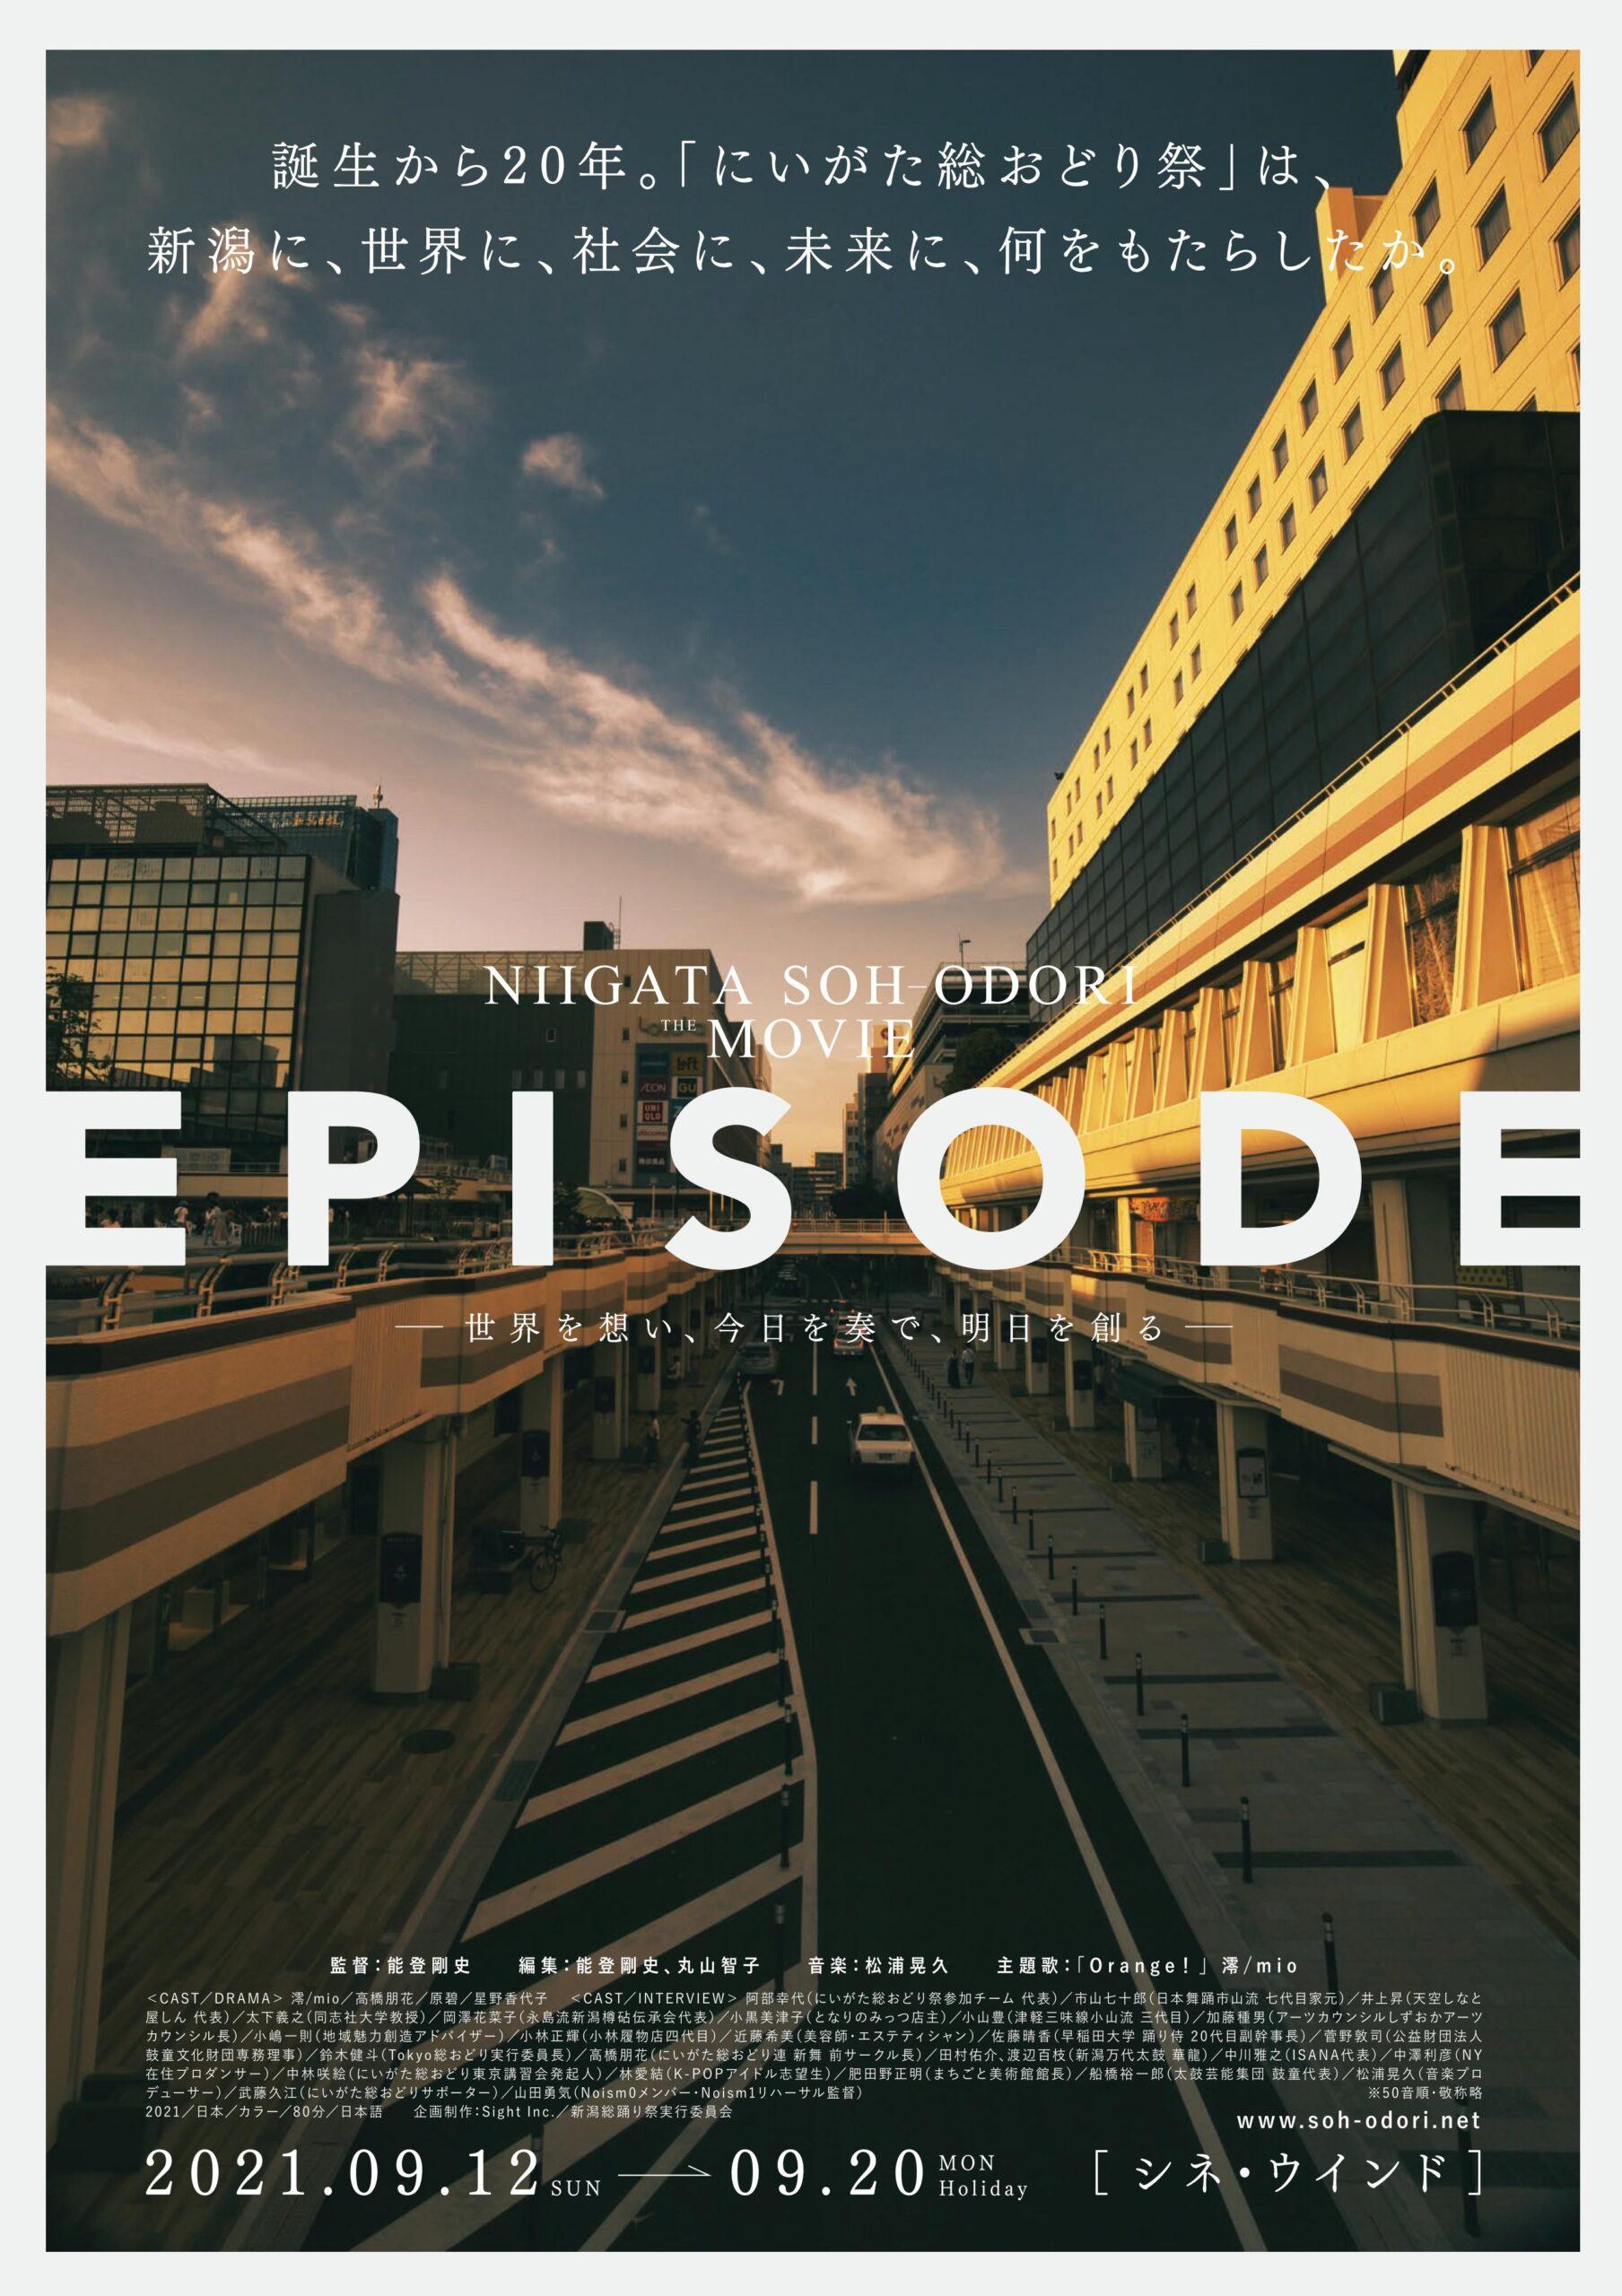 NIIGATA SOH-ODORI THE MOVIE「EPISODE」